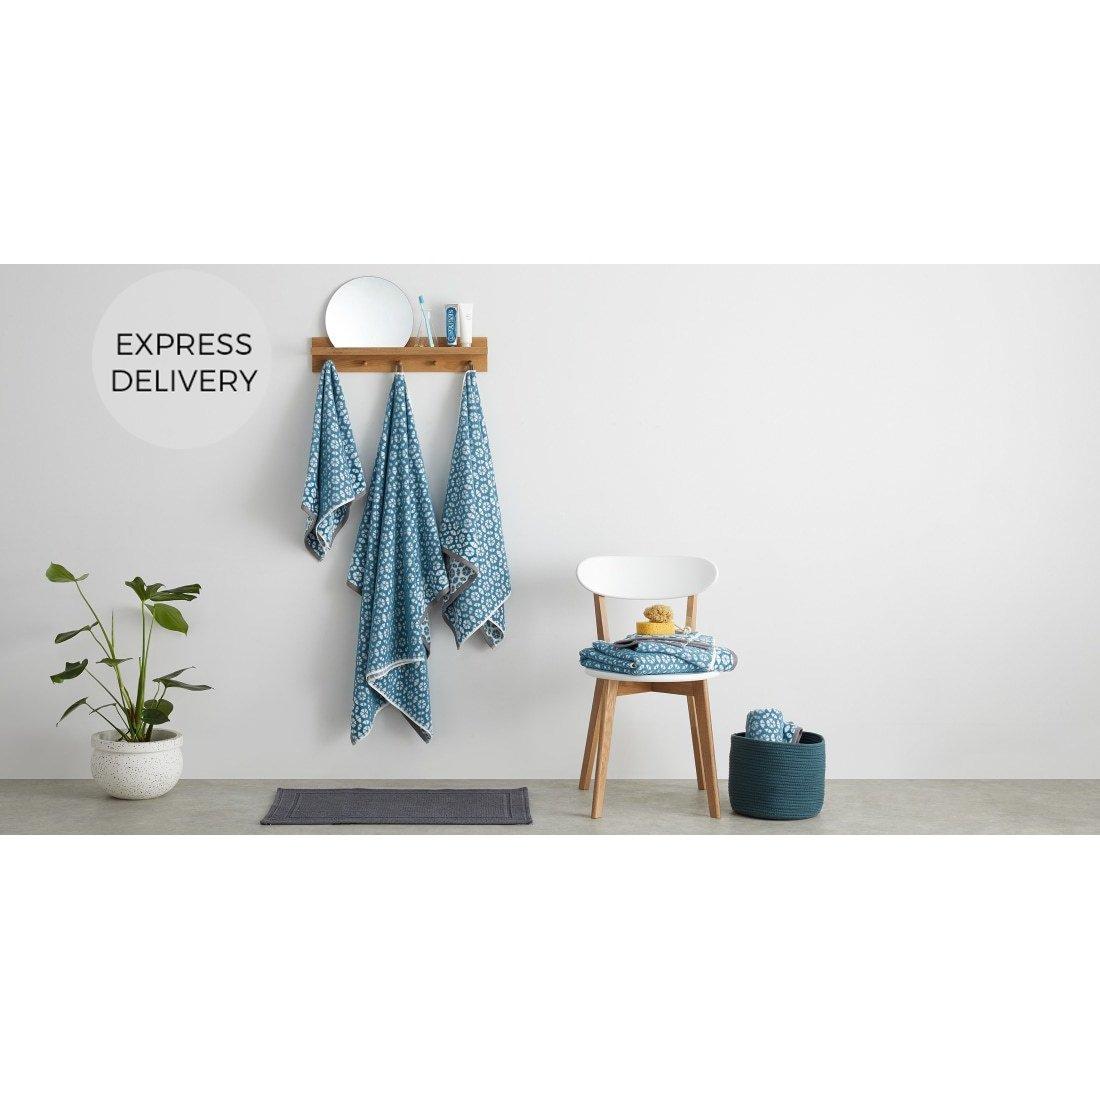 image-Trio 100% Cotton Set of 2 Hand Towels, Blue Slate